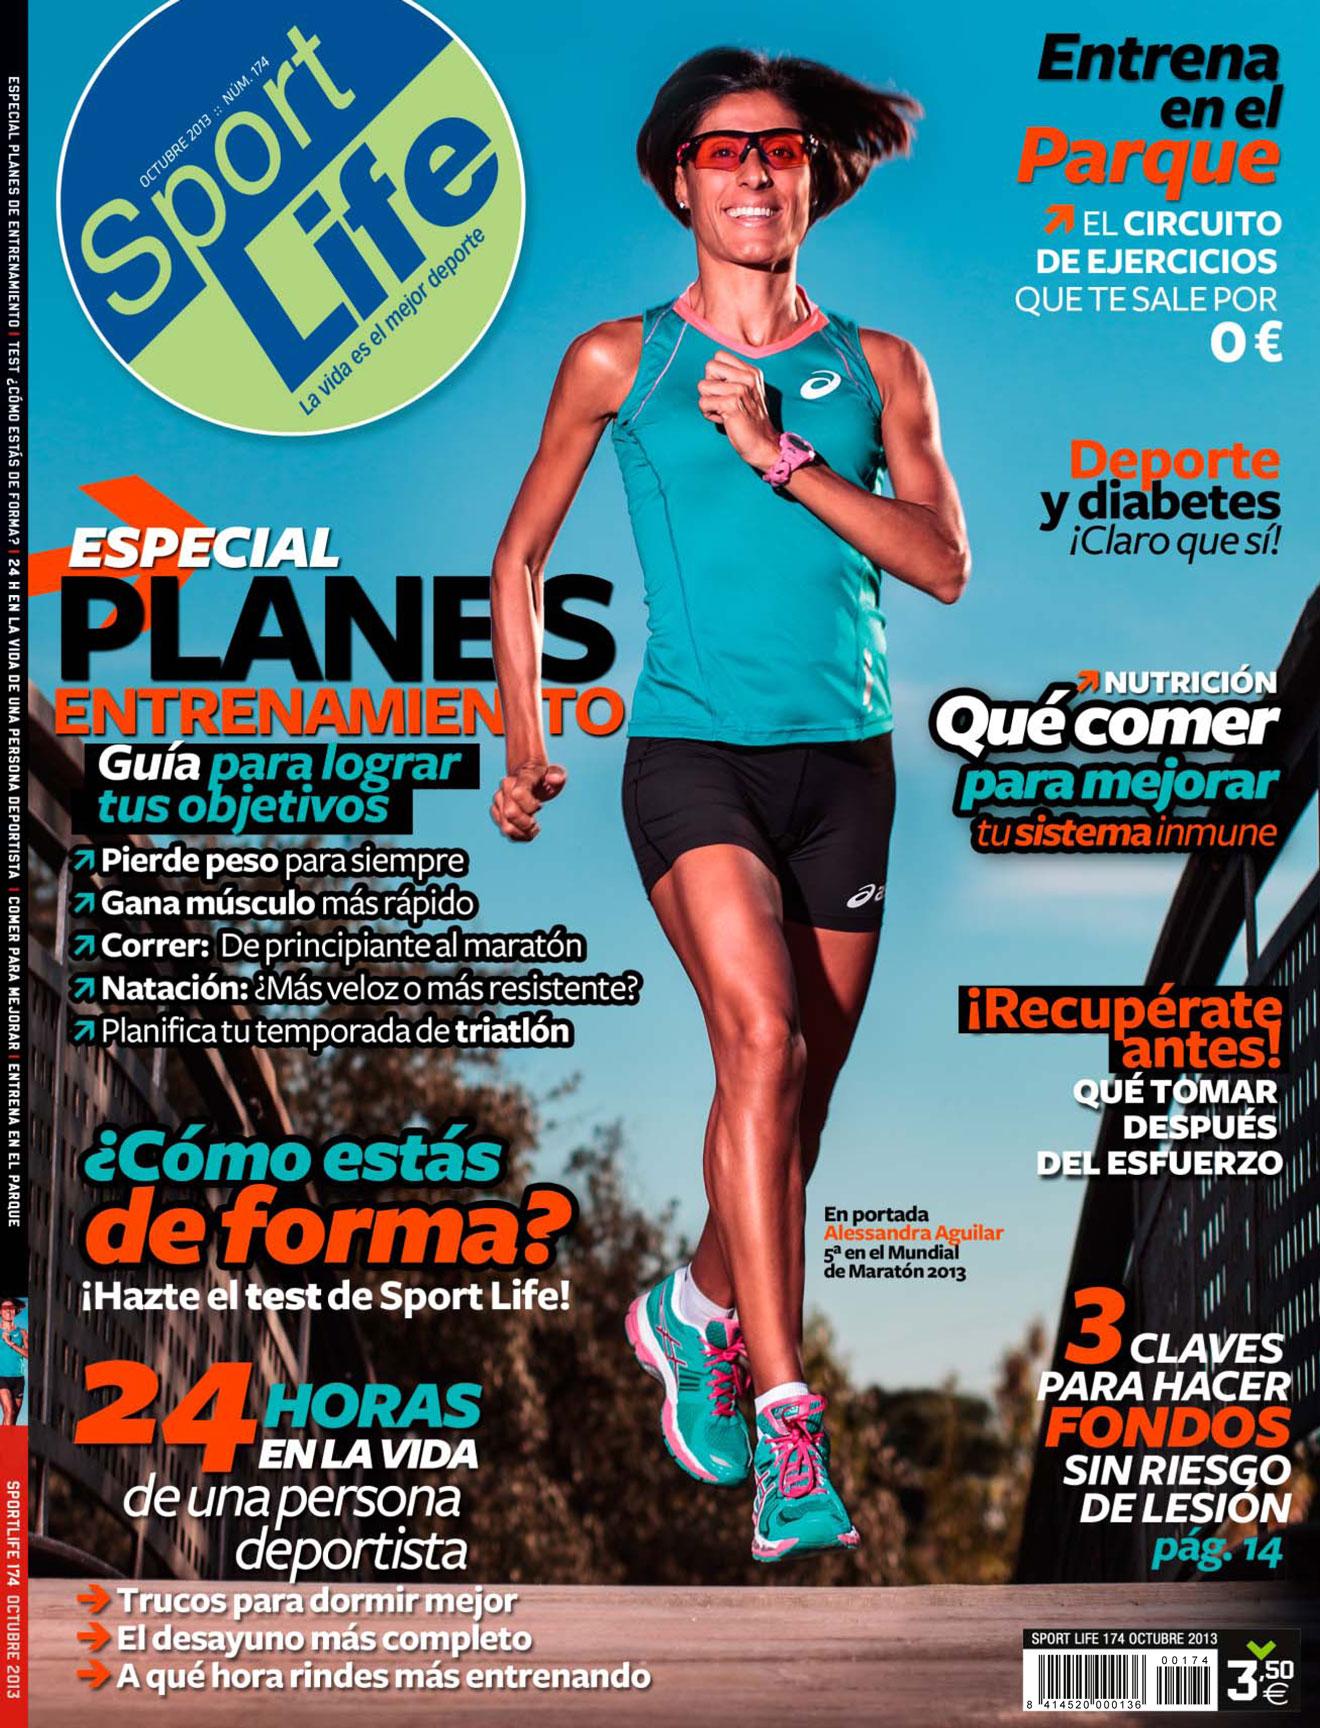 Sumario Sport Life 174 octubre 2013